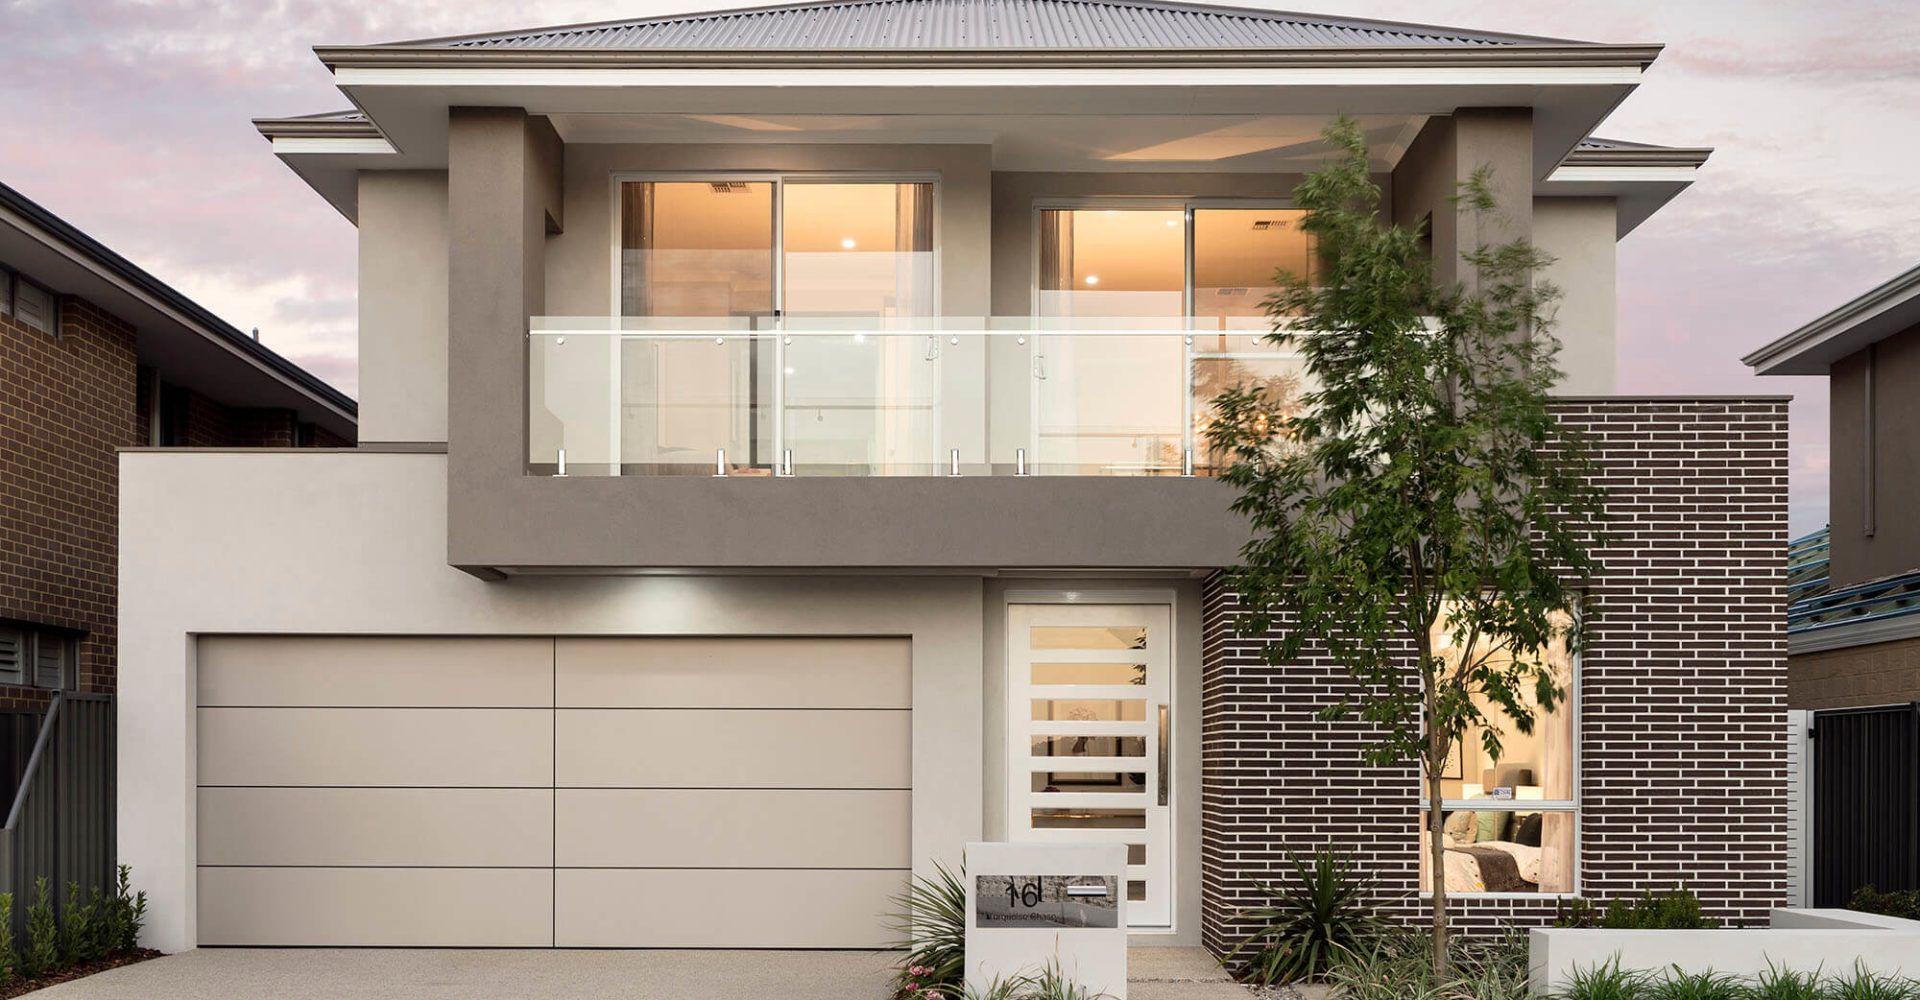 Ben Trager Homes Two Storey Homes Perth 2 Storey House Design Ben Trager Fachada De Casa Arquitectura